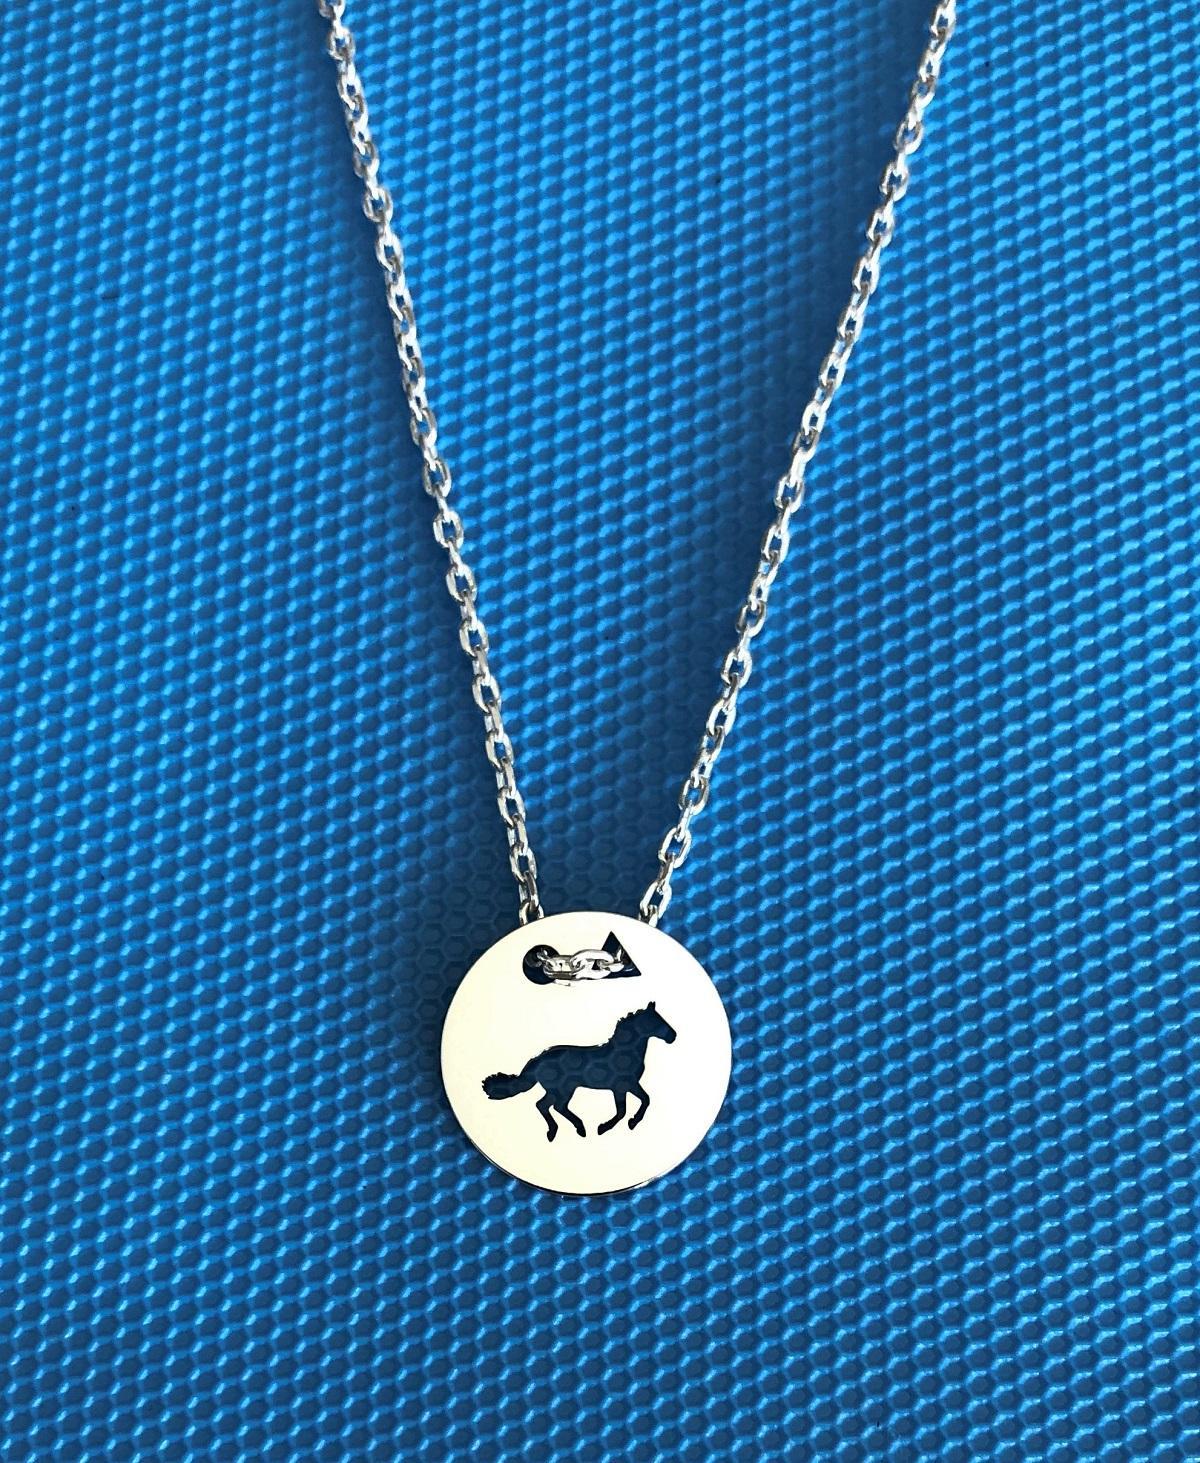 Cheval galop pend f bleu